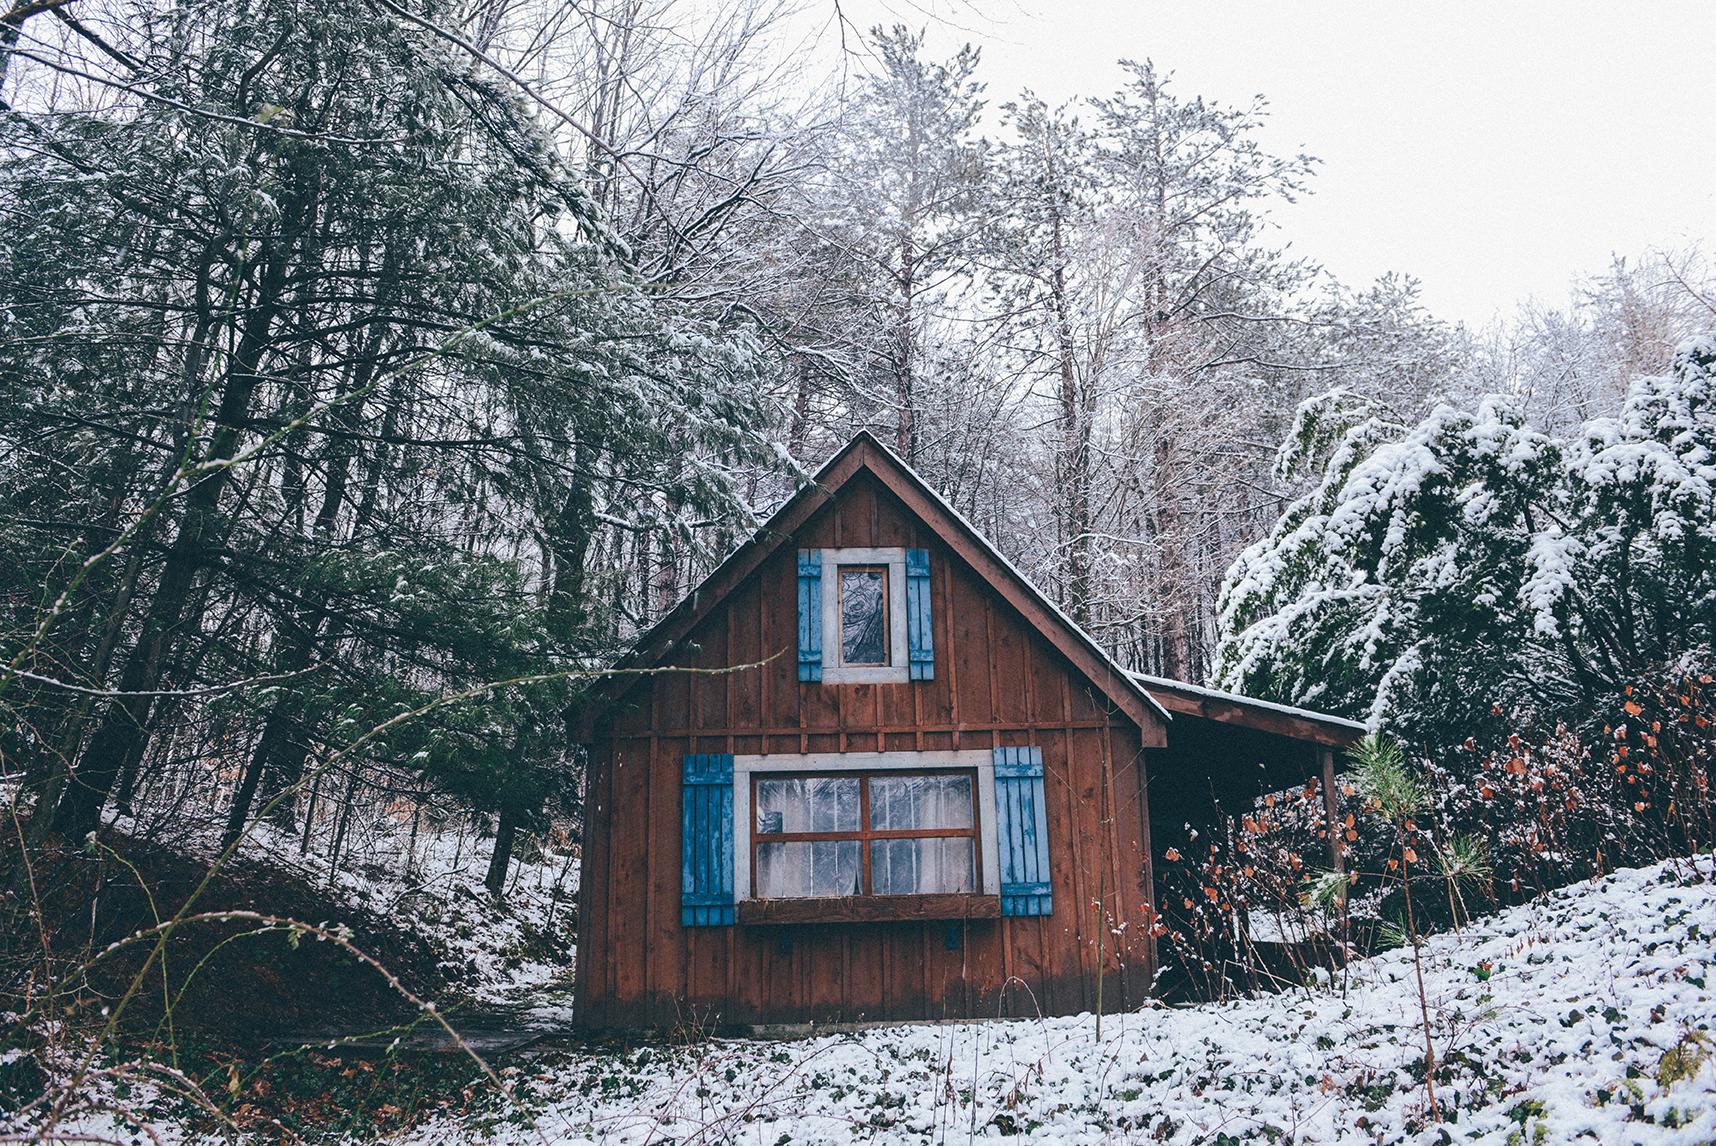 Wanderings: Beaverdam Cabin, Jennerstown, PA